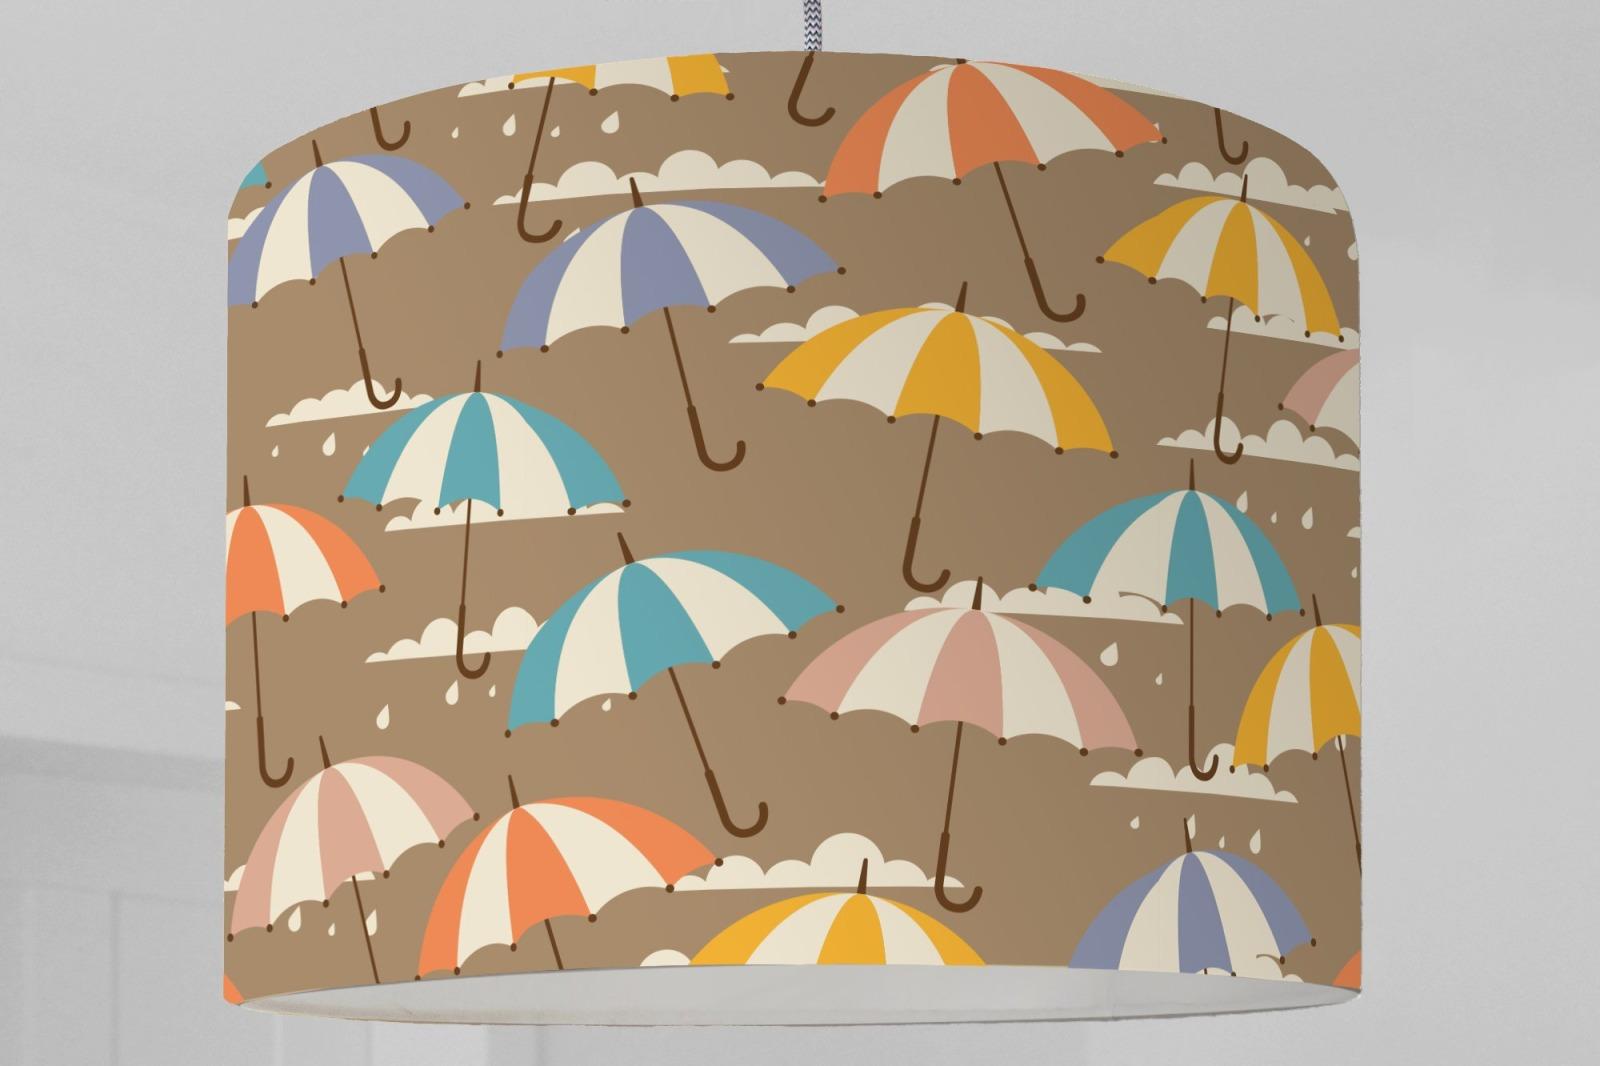 Lampenschirm Grafisches Muster Wolken Regenschirm Himmel